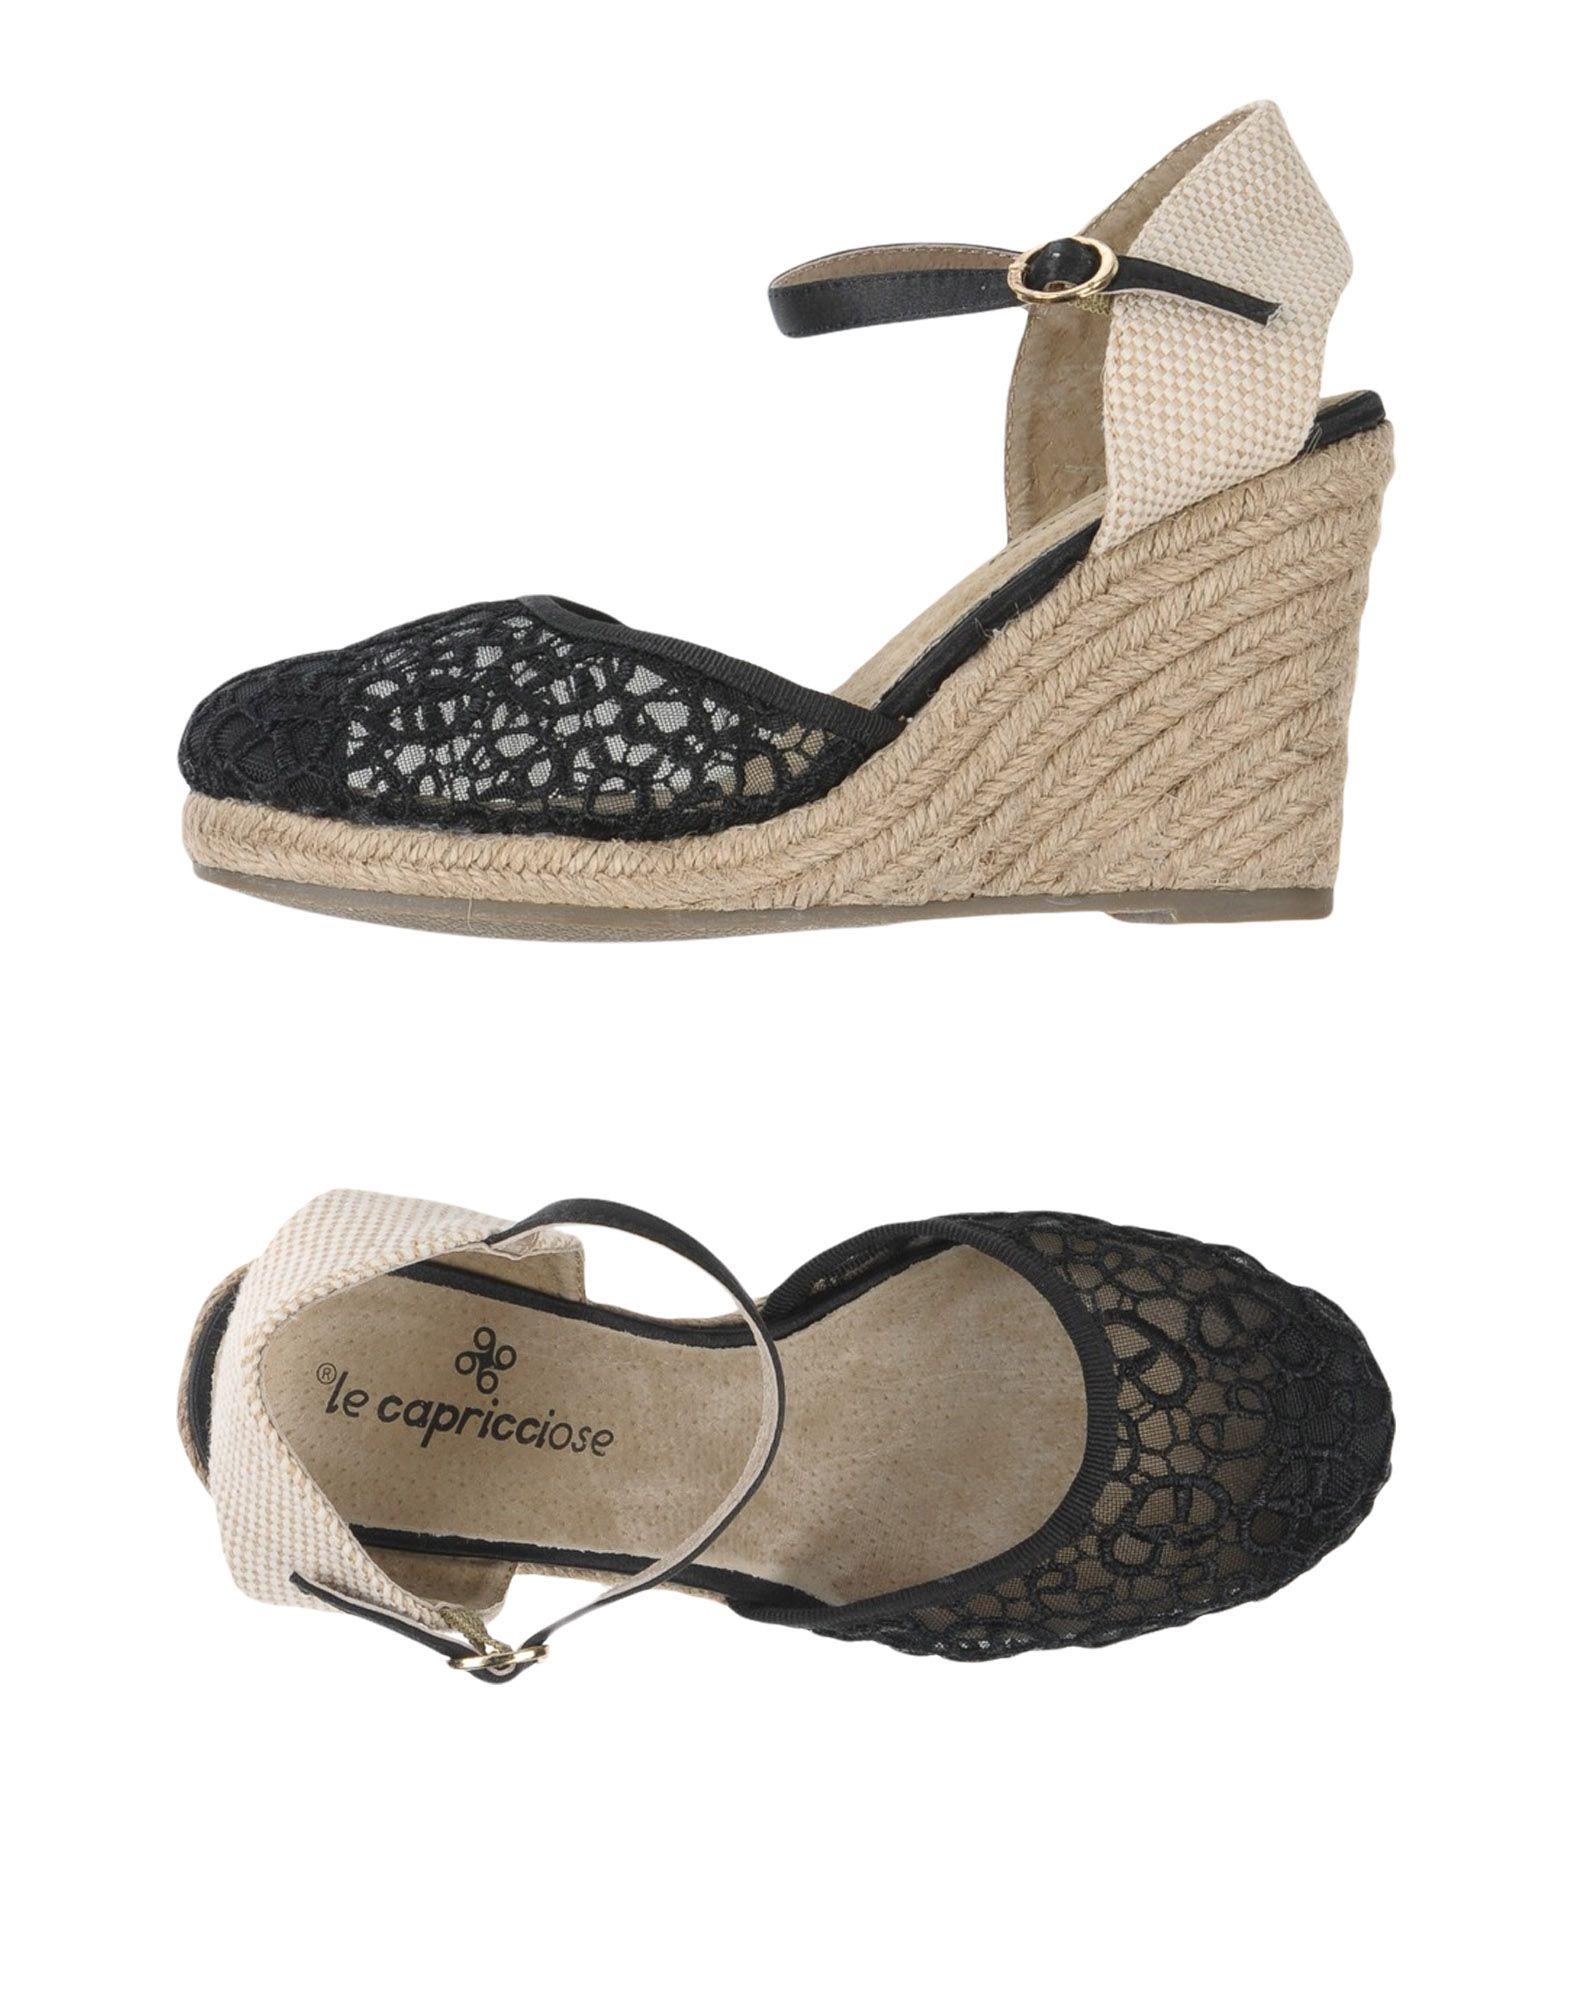 Le Capricciose® Sandals - Women Le Capricciose® Australia Sandals online on  Australia Capricciose® - 11410675QI 205c08